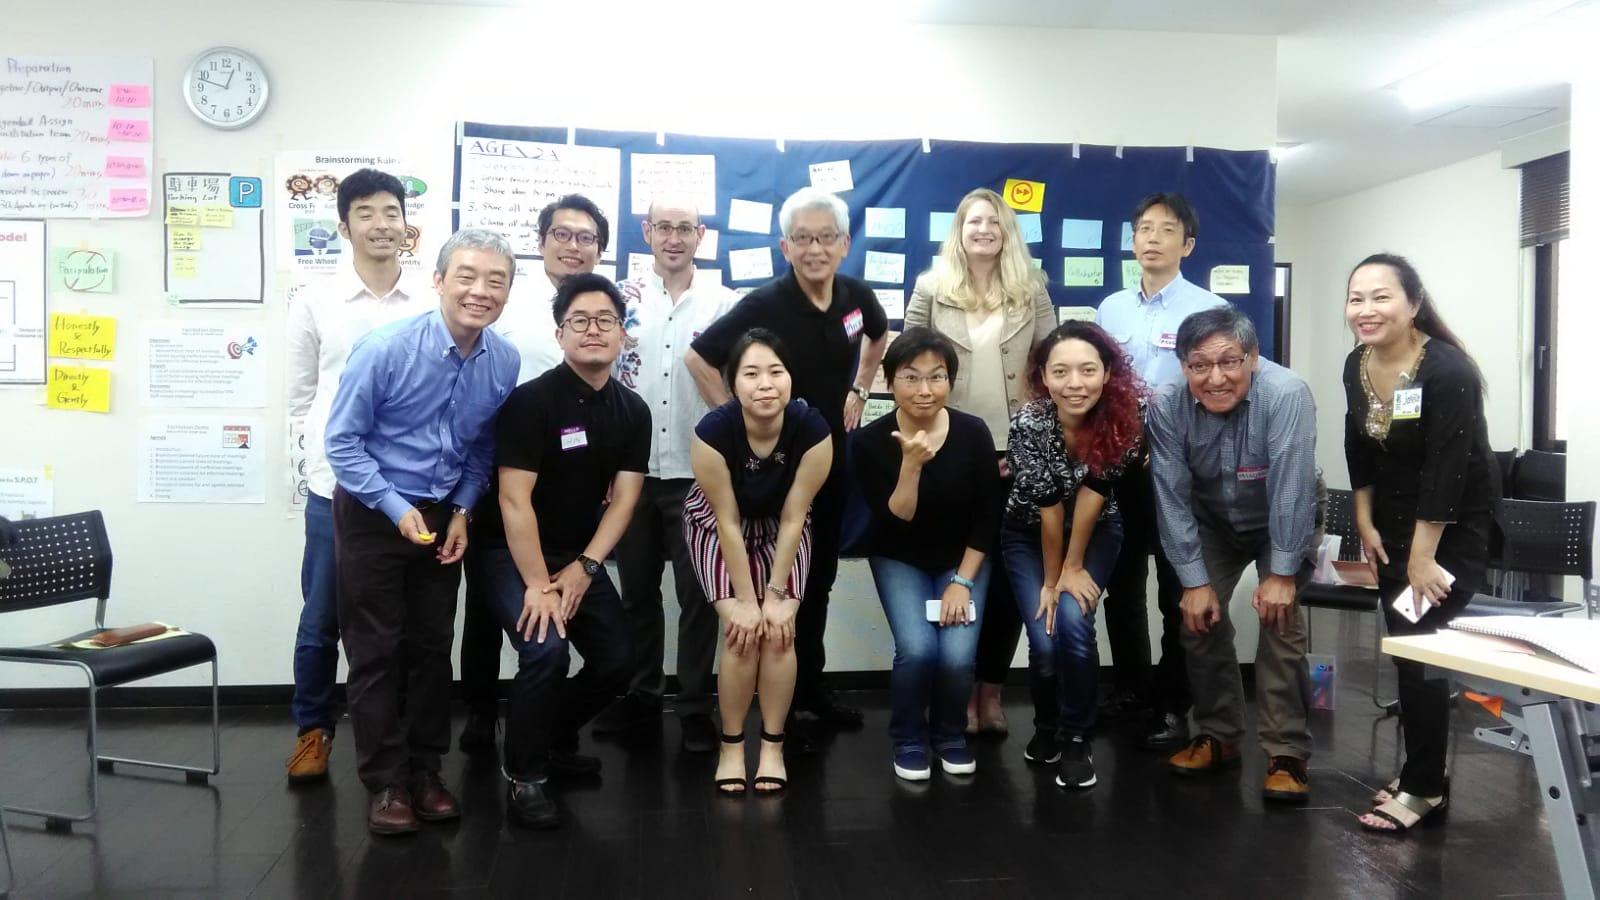 SPOTLight workshop in Tokyo, Japan on 22-23 June 2018